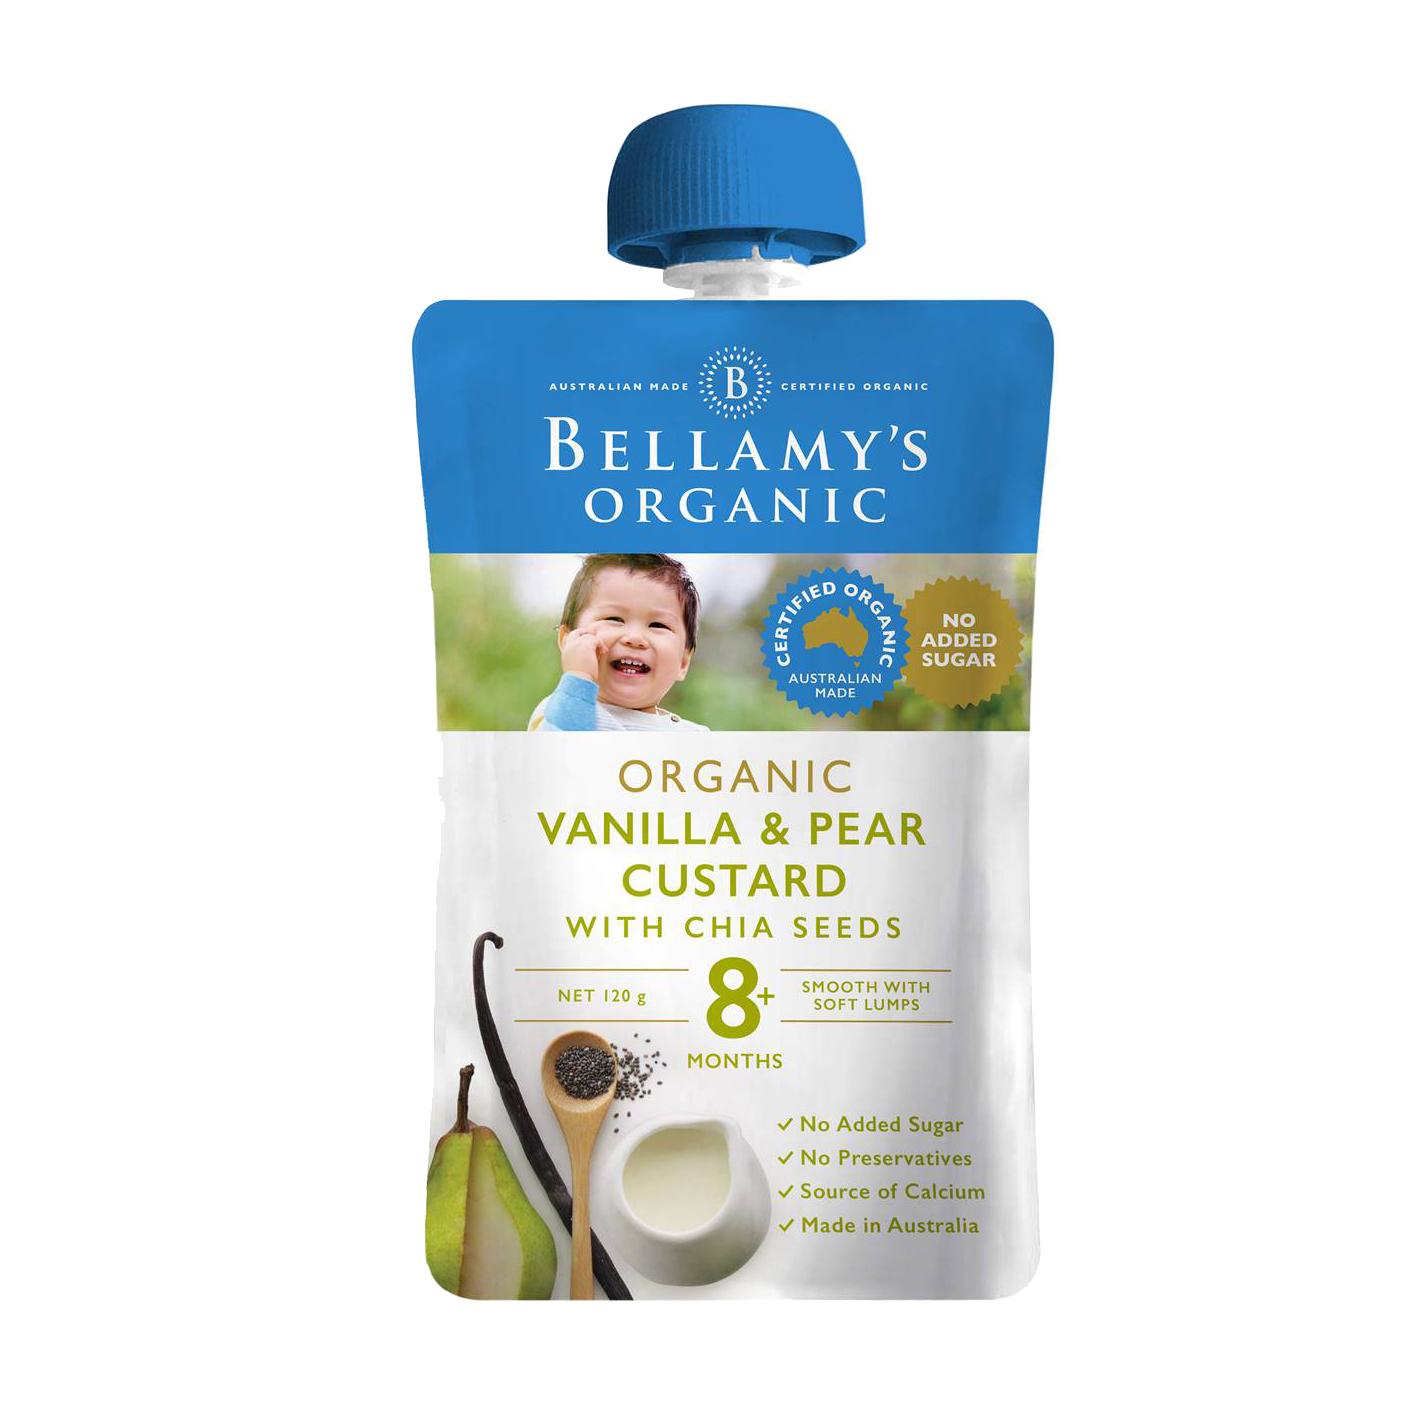 Bellamy's Organic Vanilla & Pear Custard With Chia Seeds 8 Months 120g